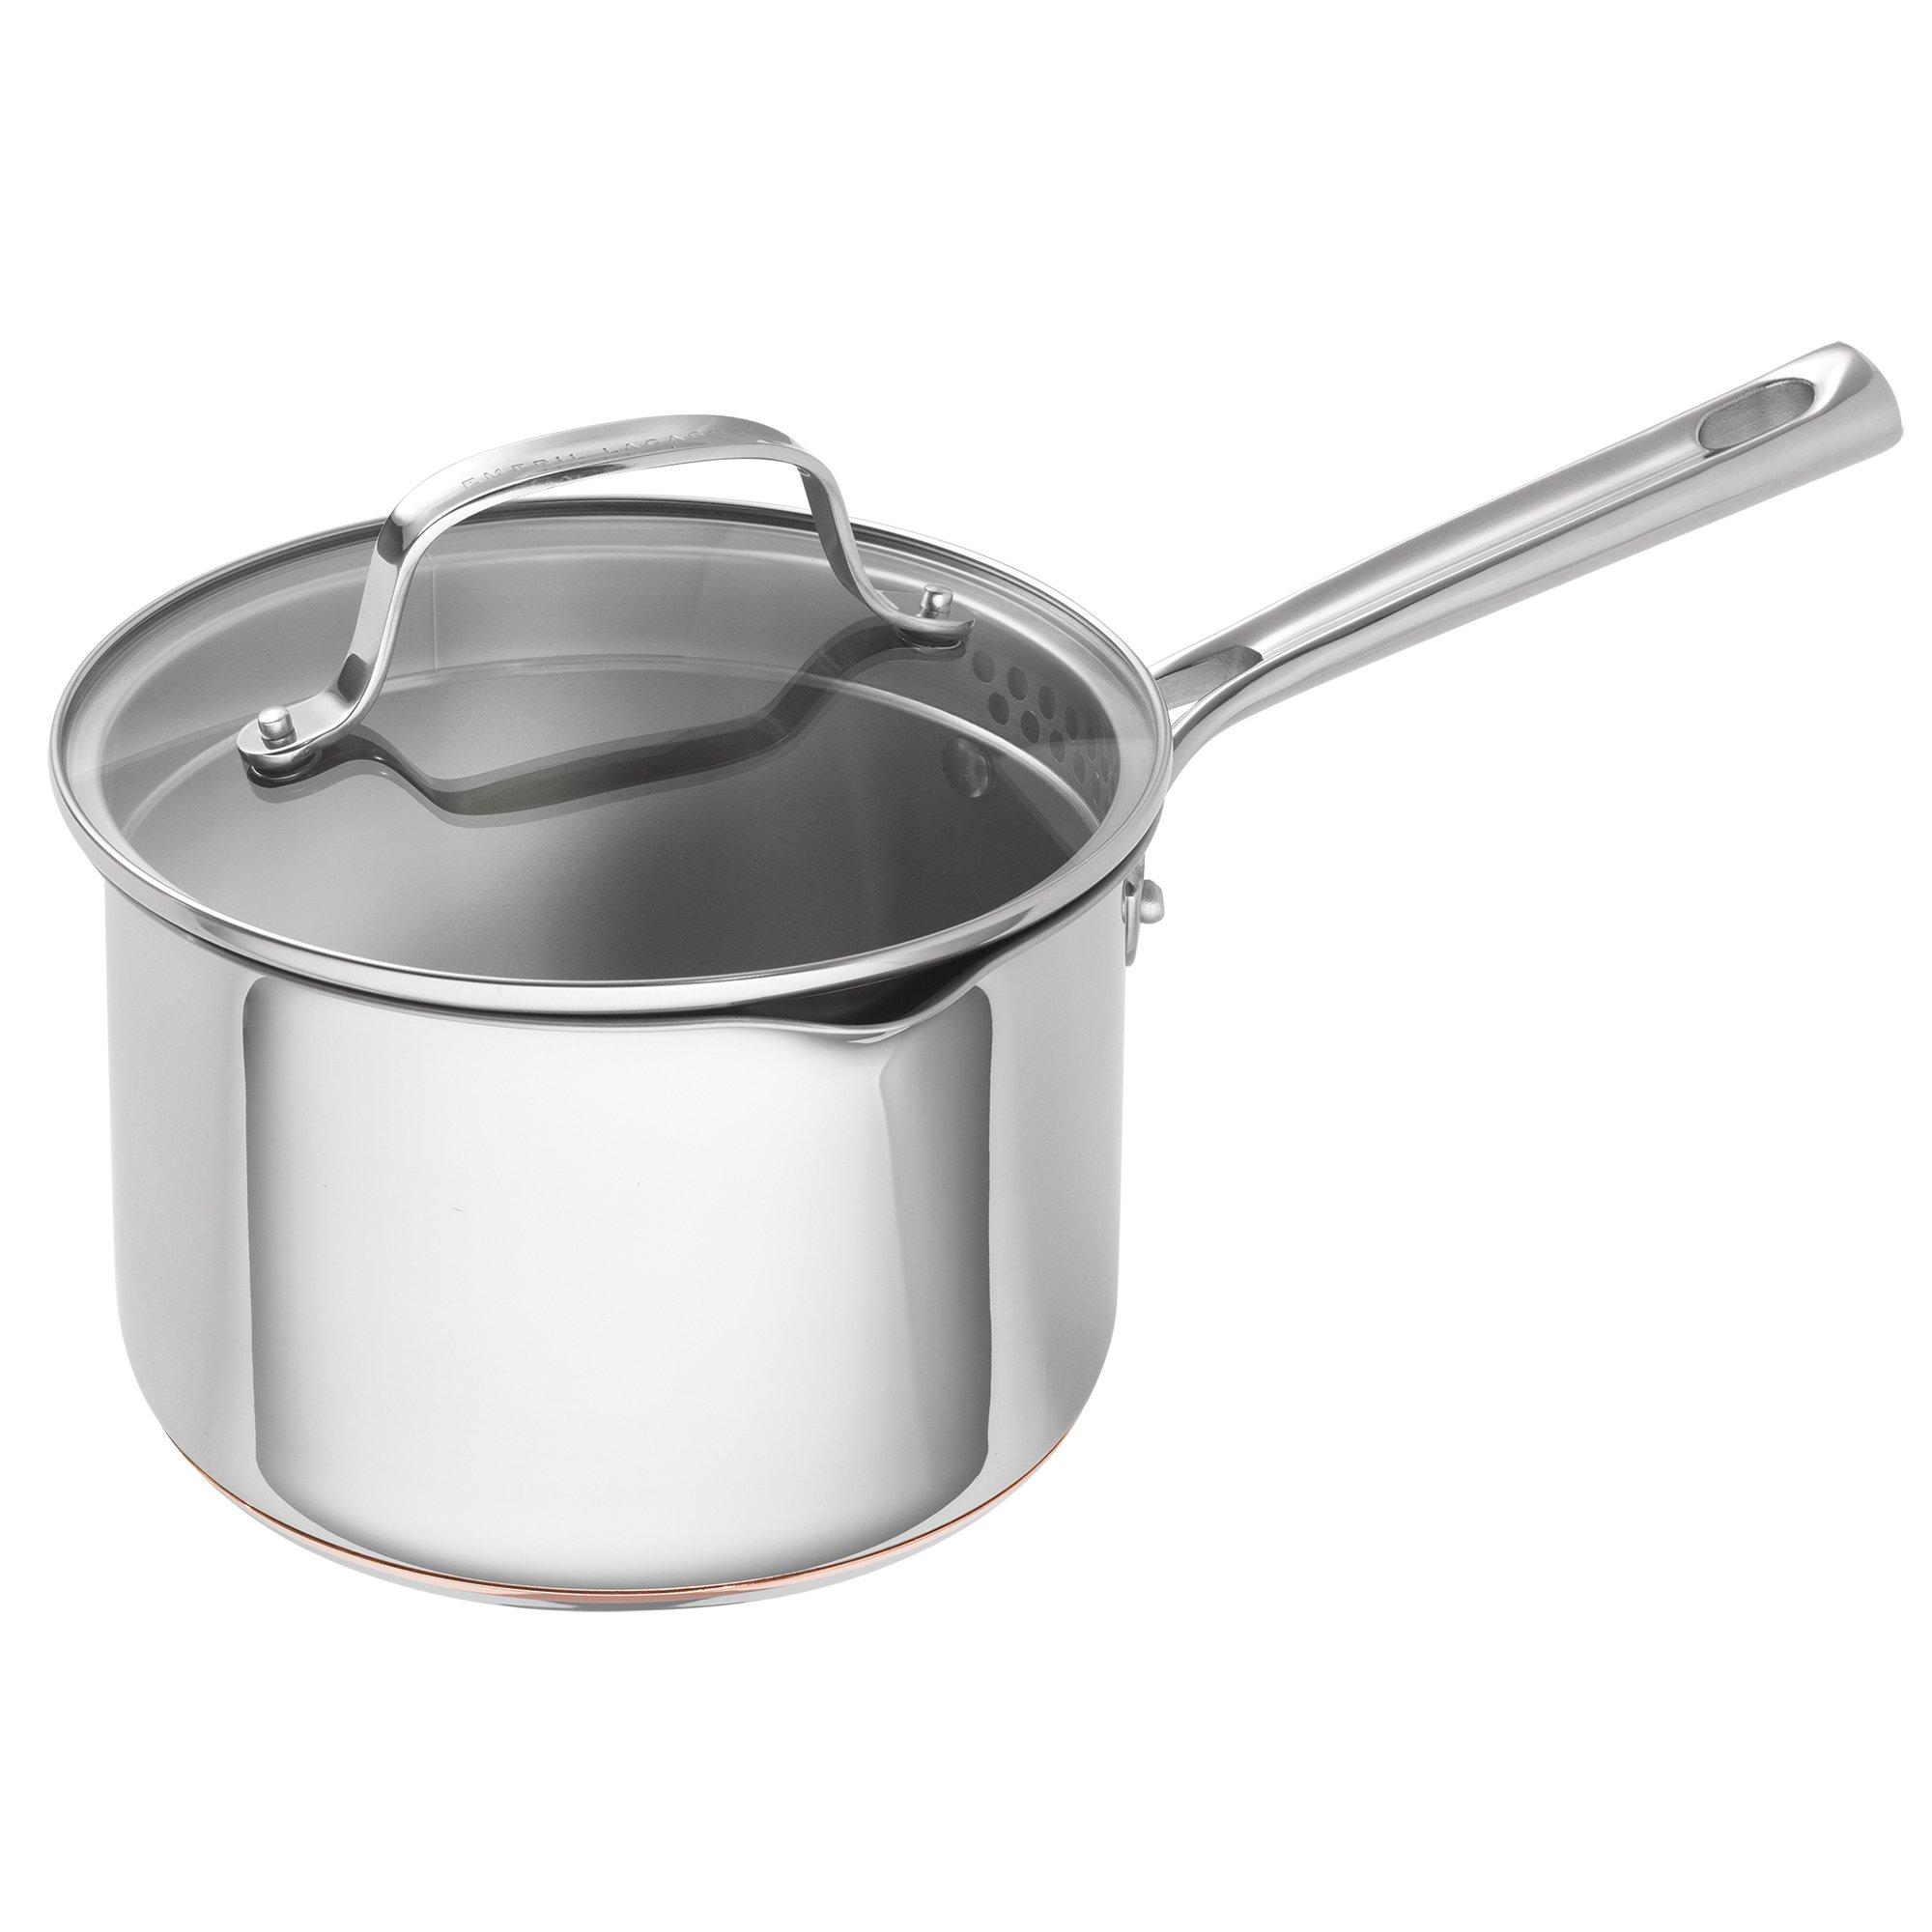 Emeril Lagasse 62897 copper core cookware stock pot, 3 quart, Silver